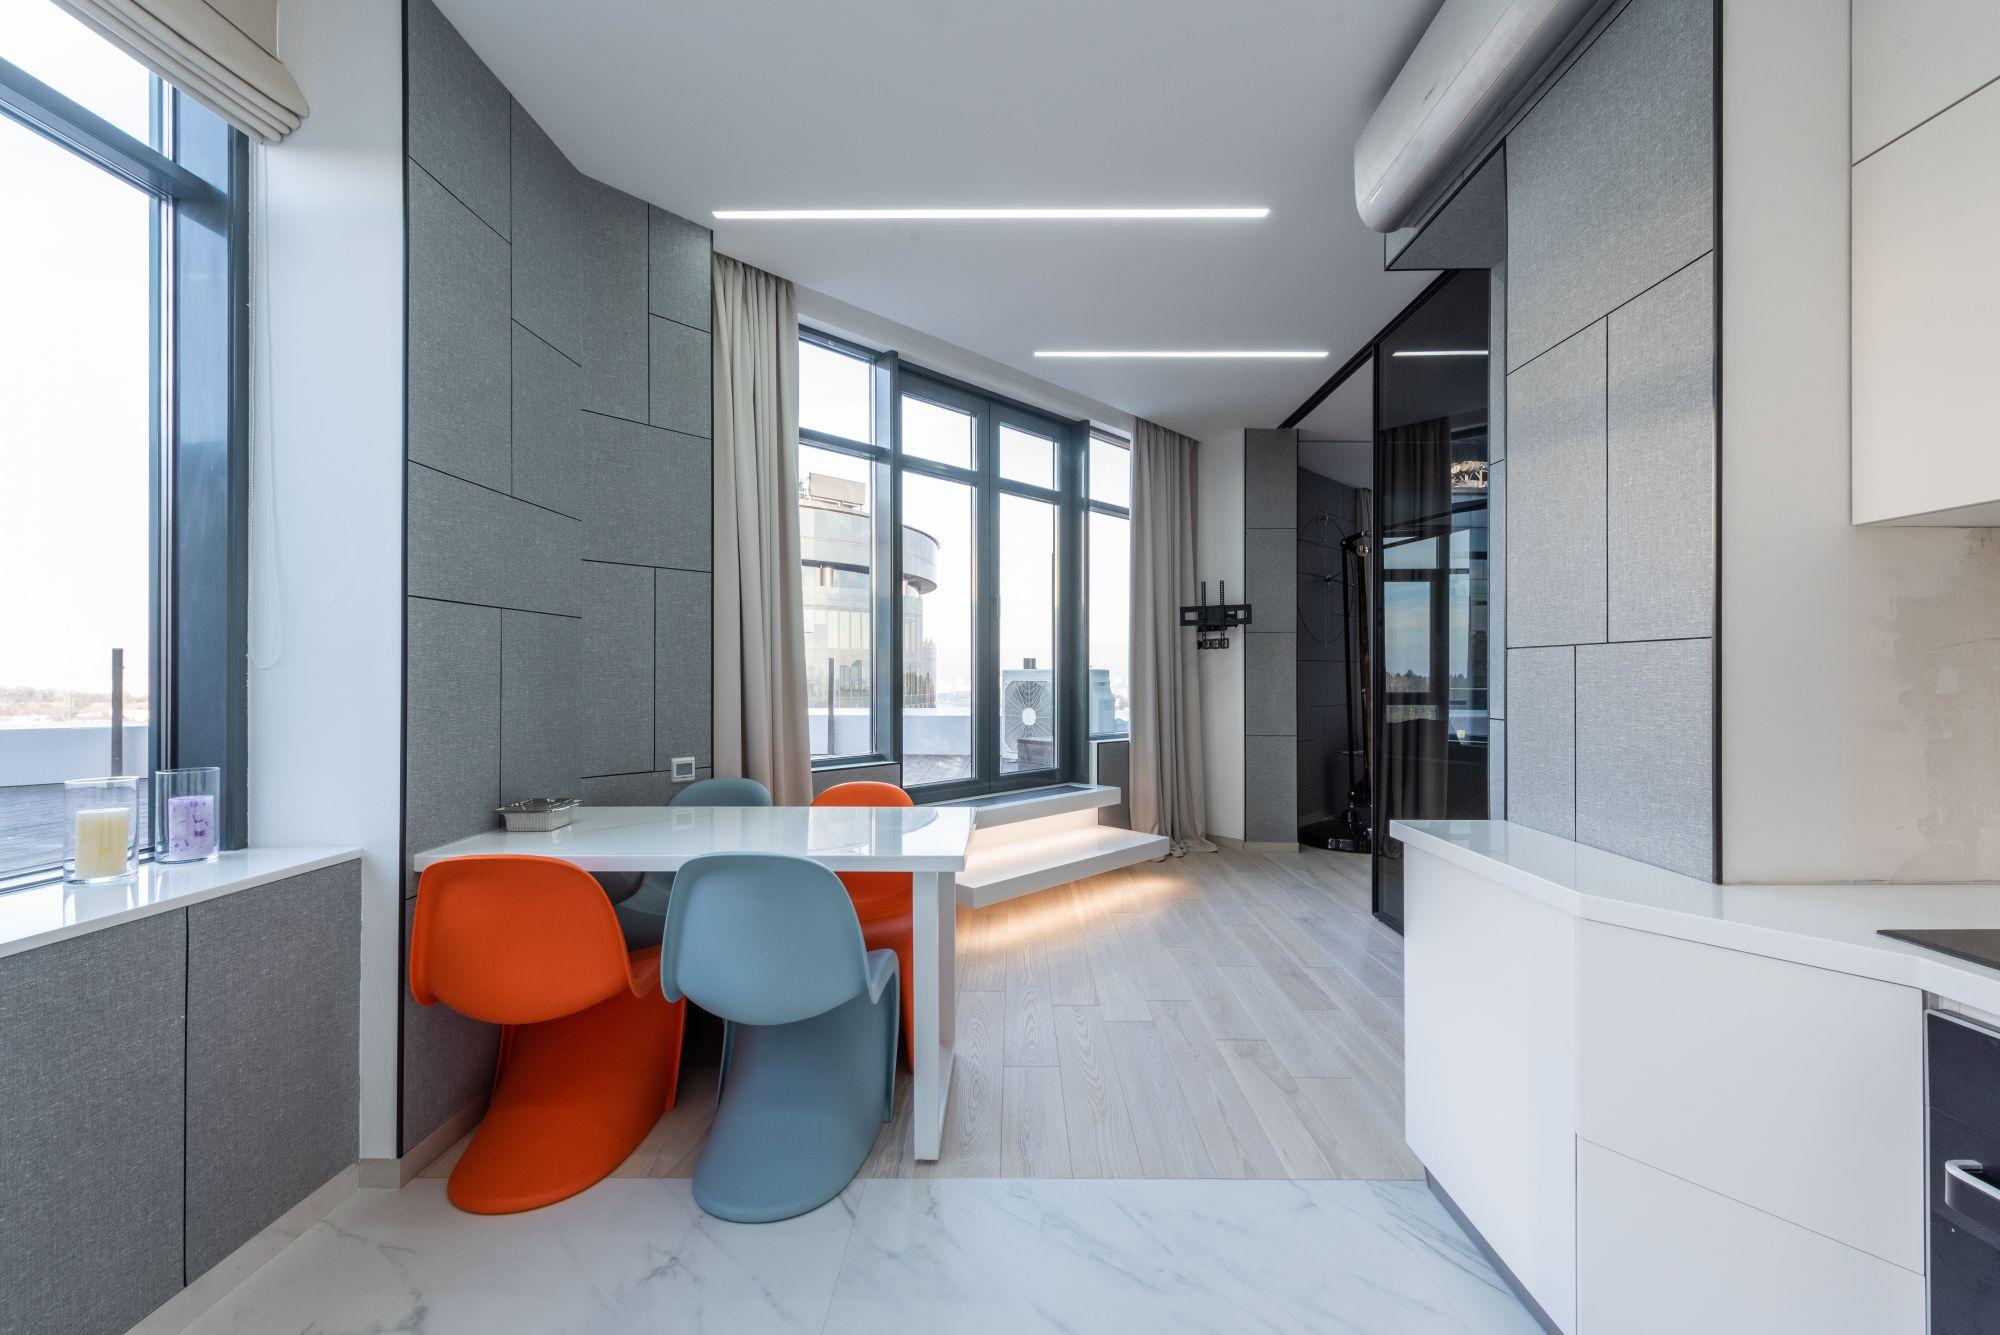 Arredare casa: meglio affidarsi a un designer d'interni